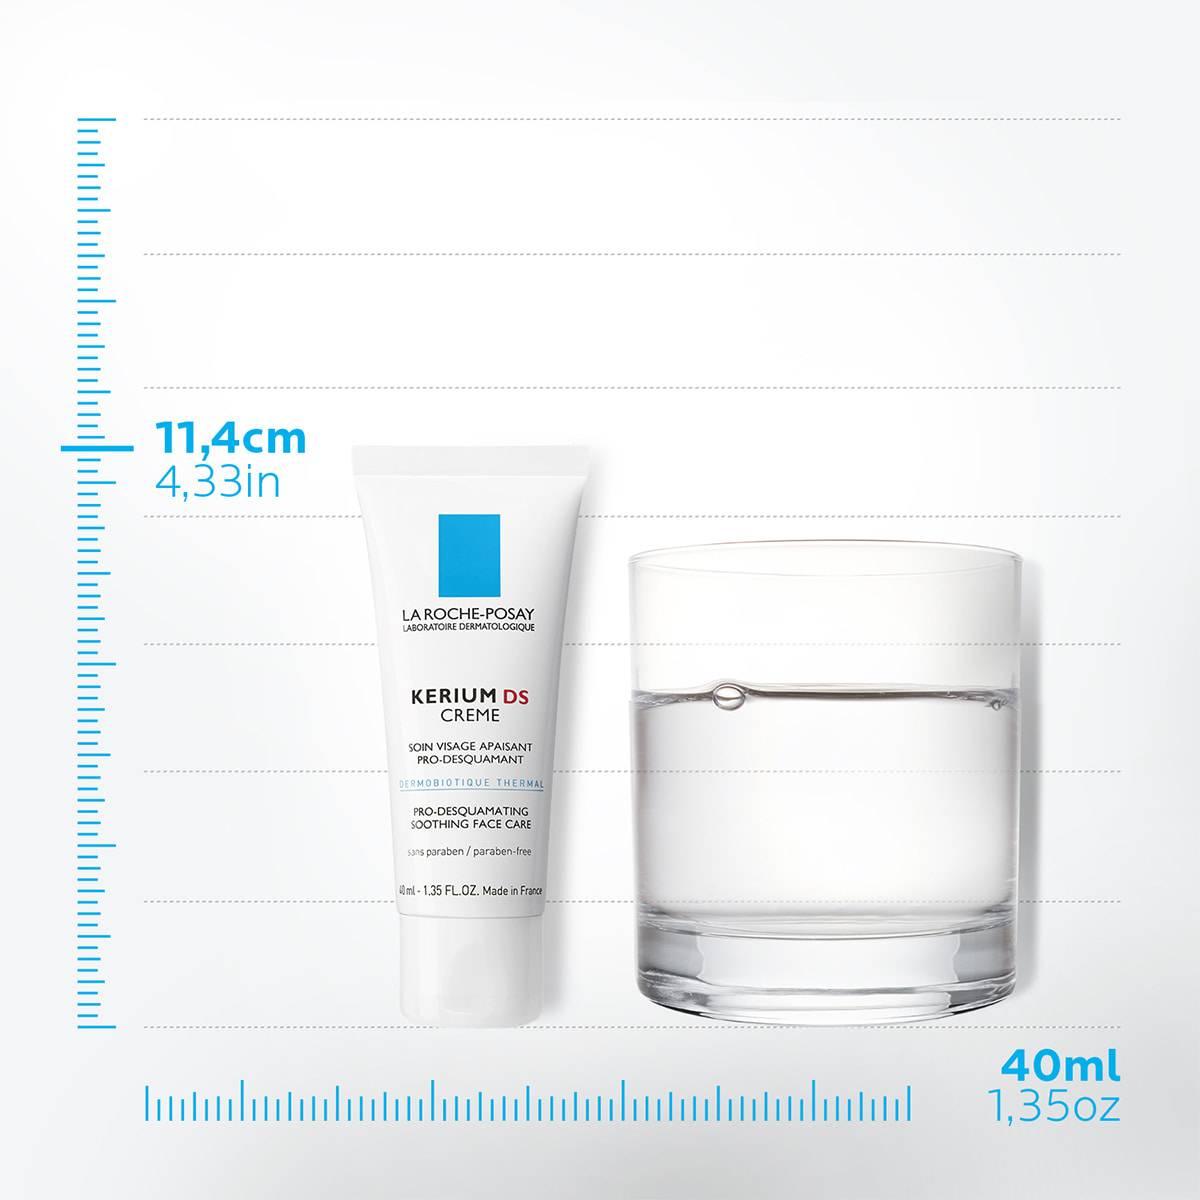 La Roche Posay ProductPage Kerium DS Face Cream 40ml 3337872411793